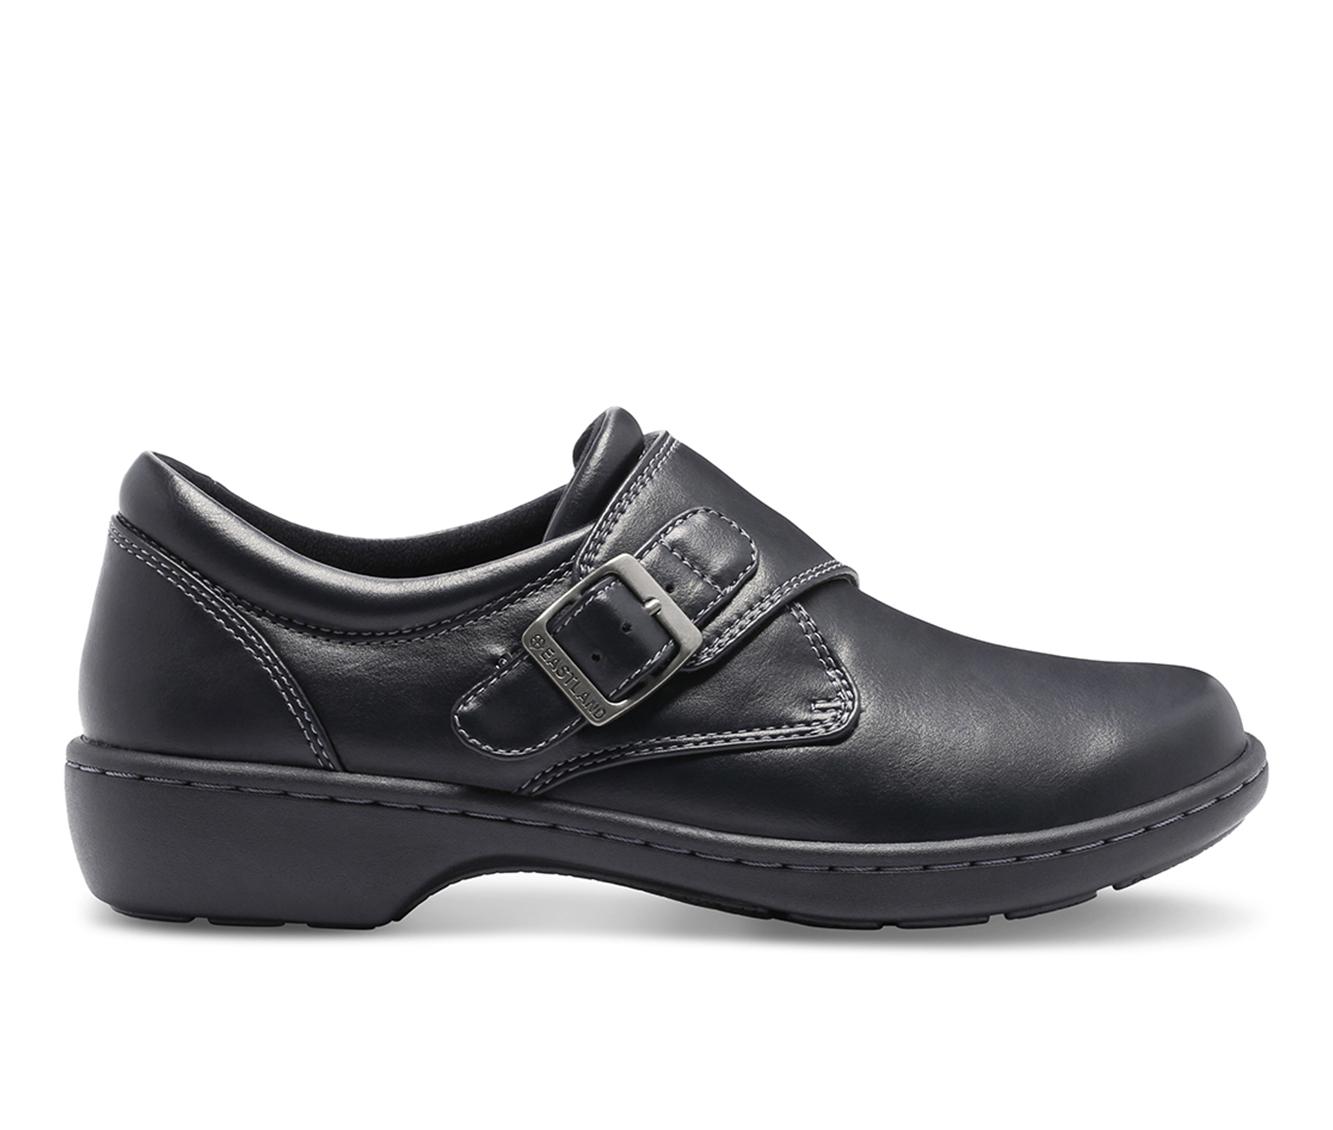 Eastland Sherri Women's Shoe (Black Leather)